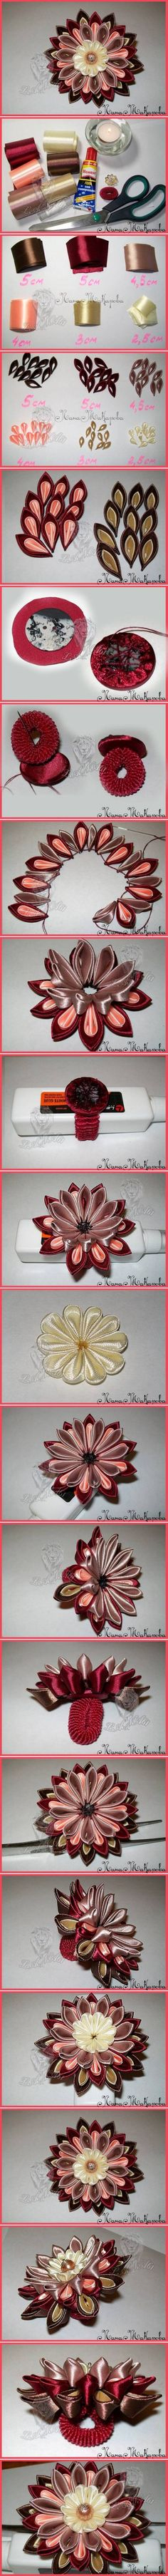 DIY Beautiful Kanzashi Ribbon Flower | www.FabArtDIY.com LIKE Us on Facebook ==> https://www.facebook.com/FabArtDIY